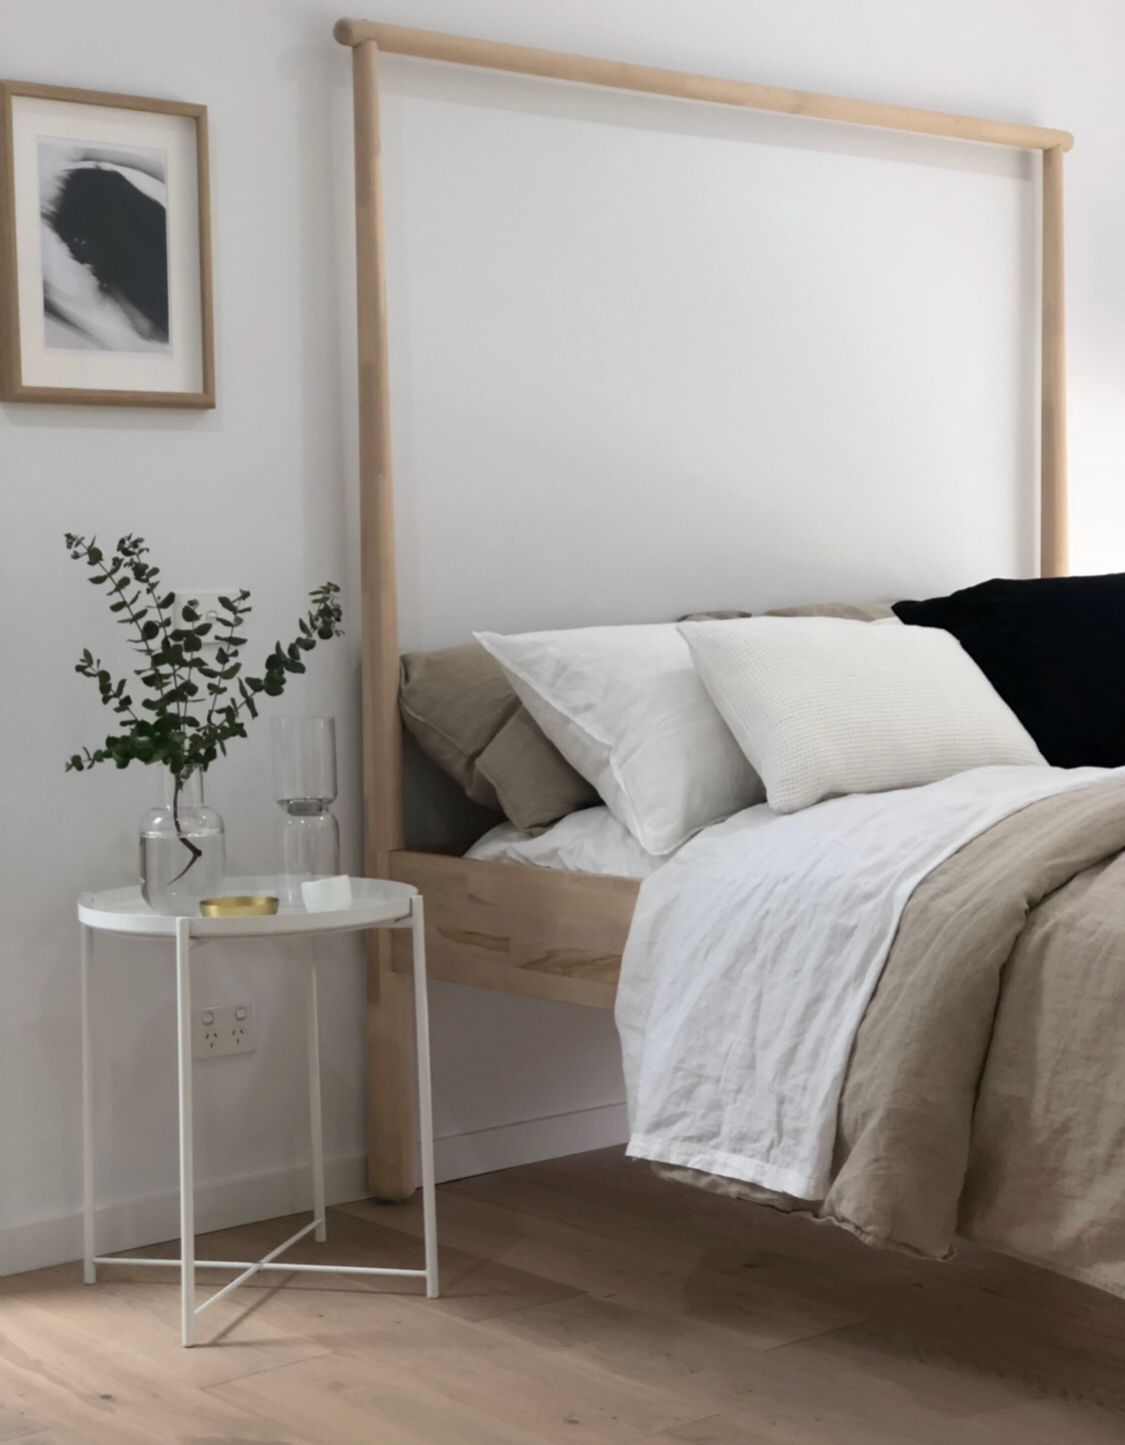 Bed inspiration | Minimalist bedroom, Minimalist bed ...